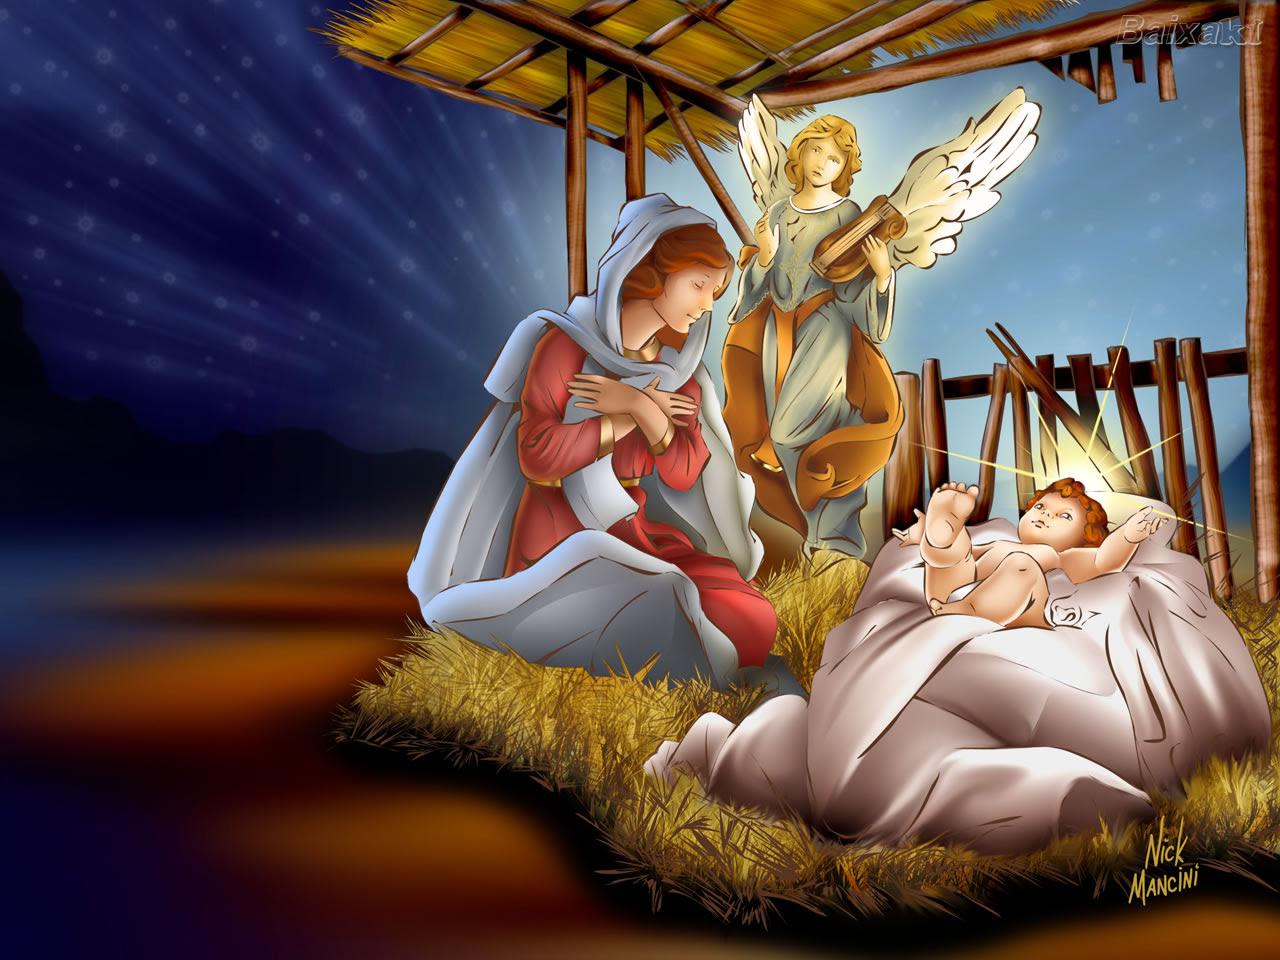 http://www.sesawi.net/wp-content/uploads/2011/12/natal-lagu.jpg